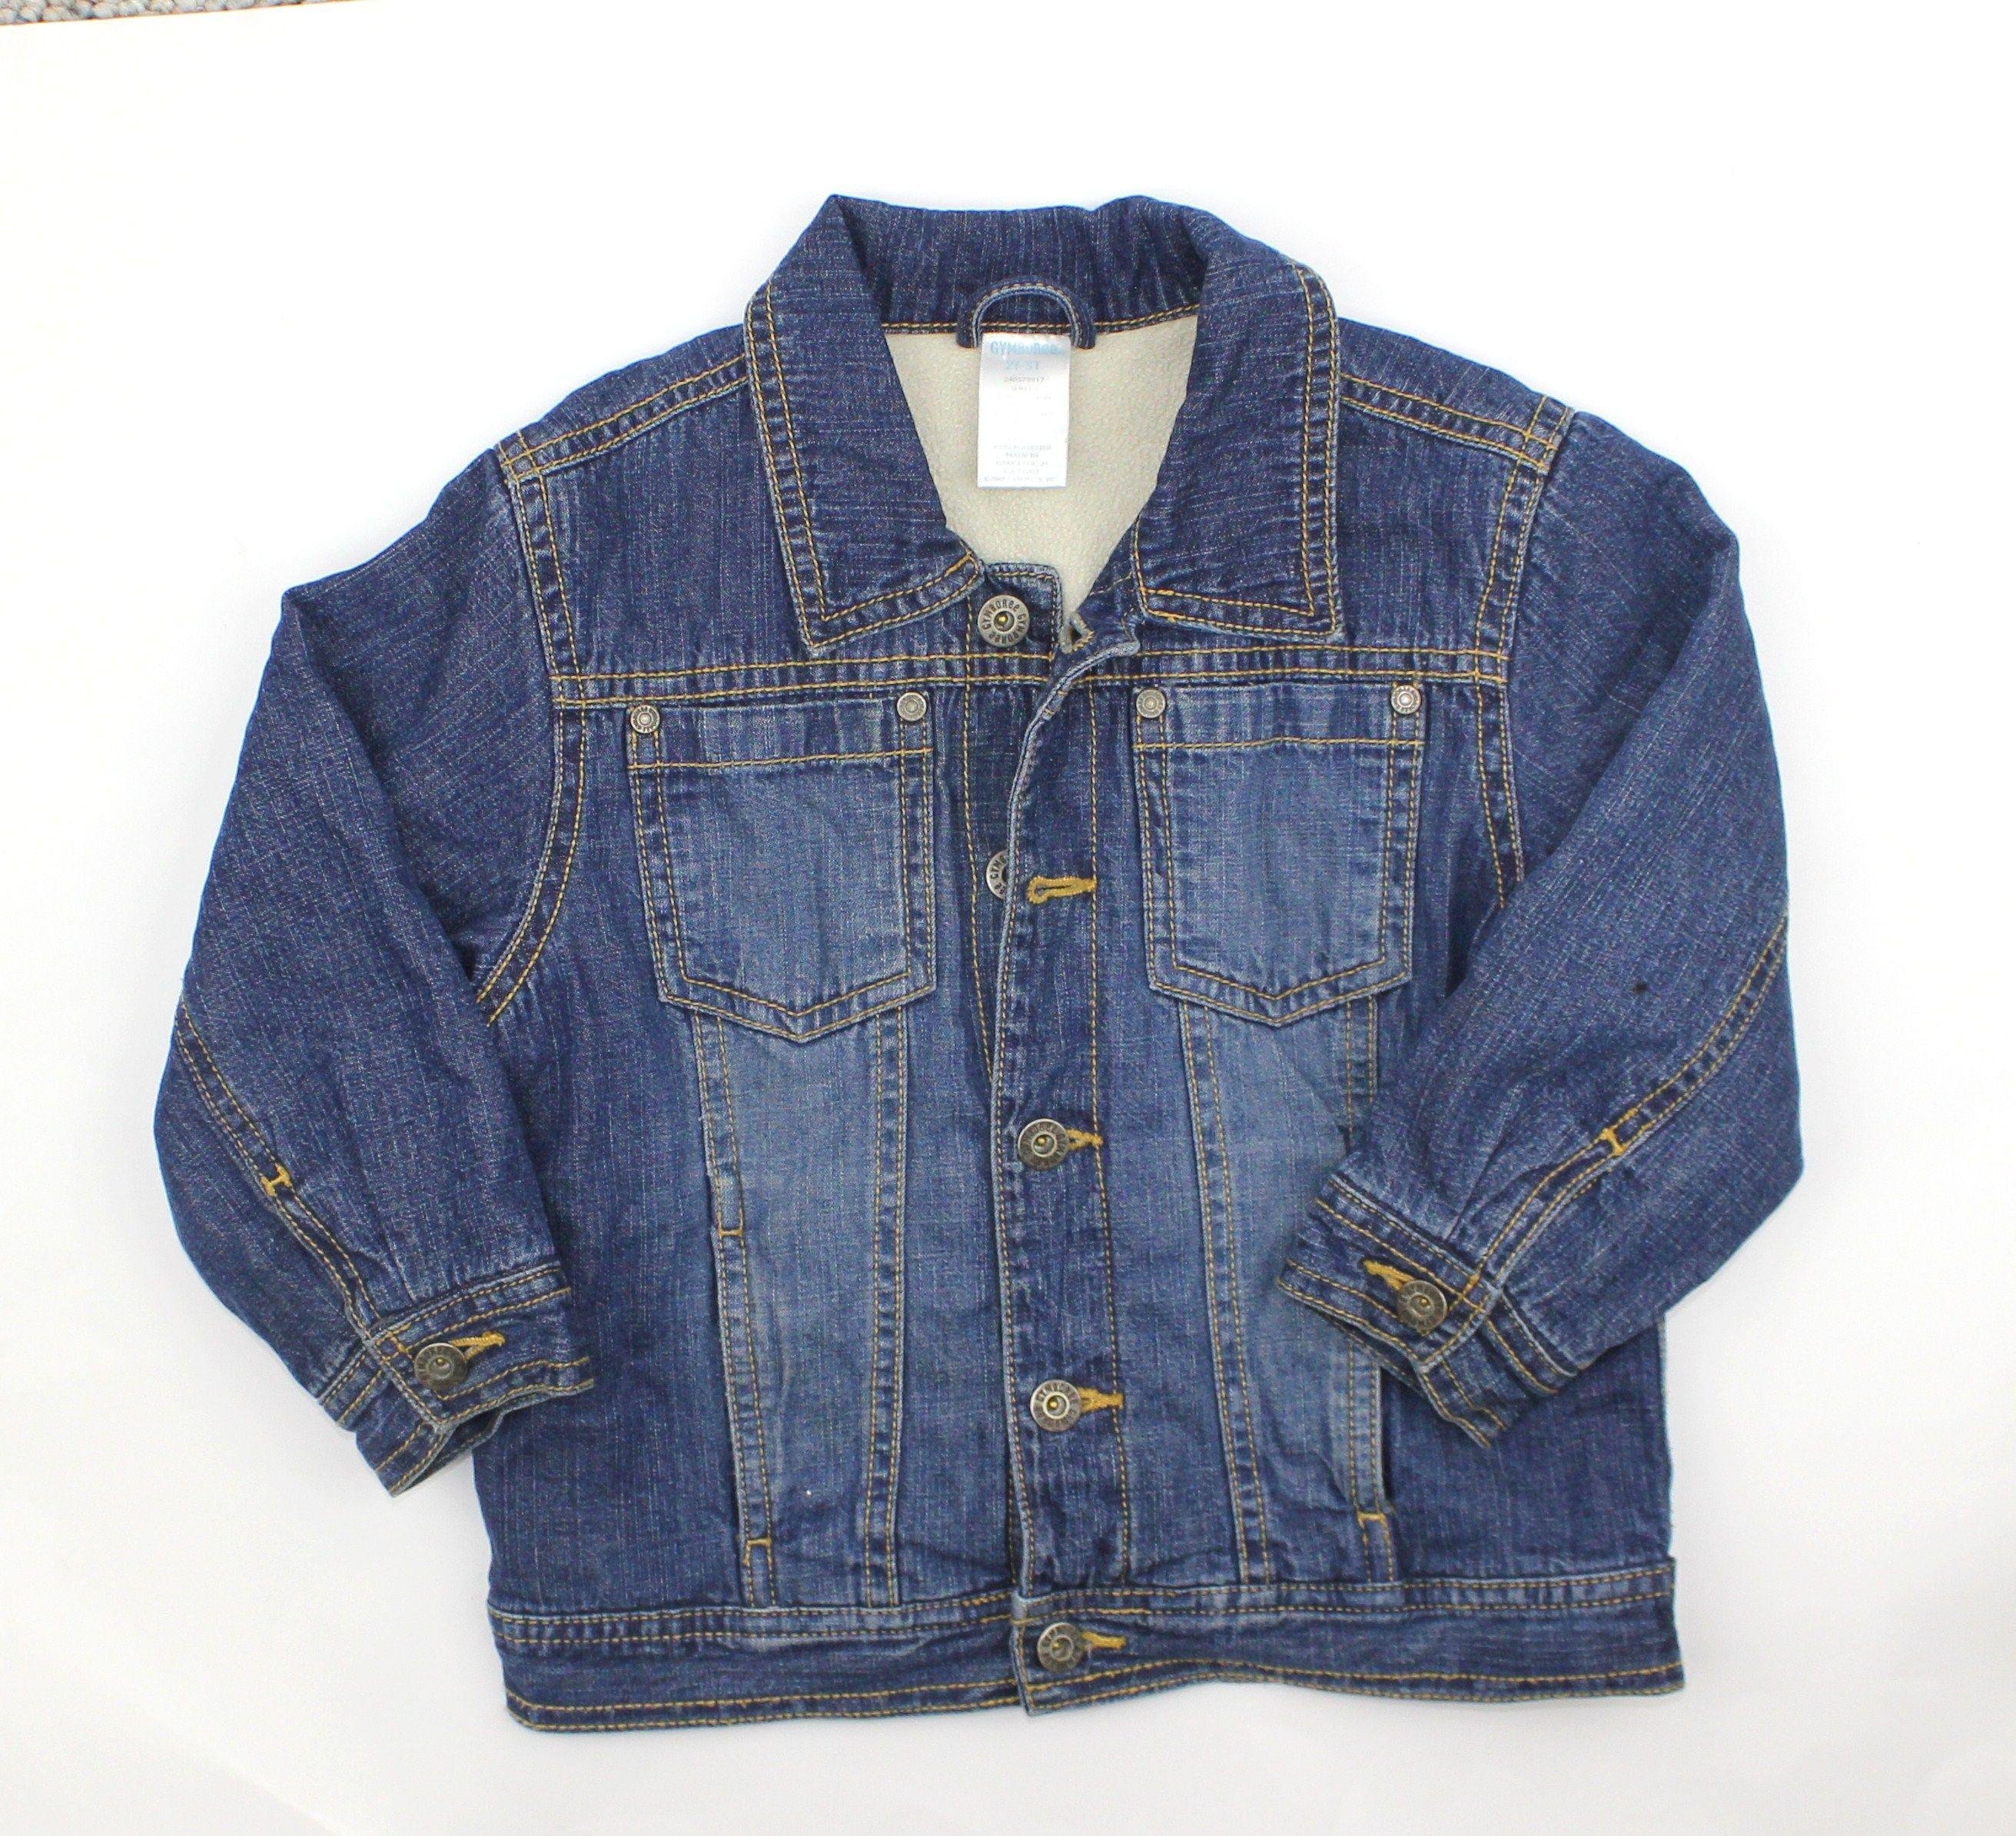 Kids Shearling Lined Denim Jacket By Gymboree In Size 2t 3t Only 6 Online Resale Lined Denim Jacket Girls Jacket Girl Outfits